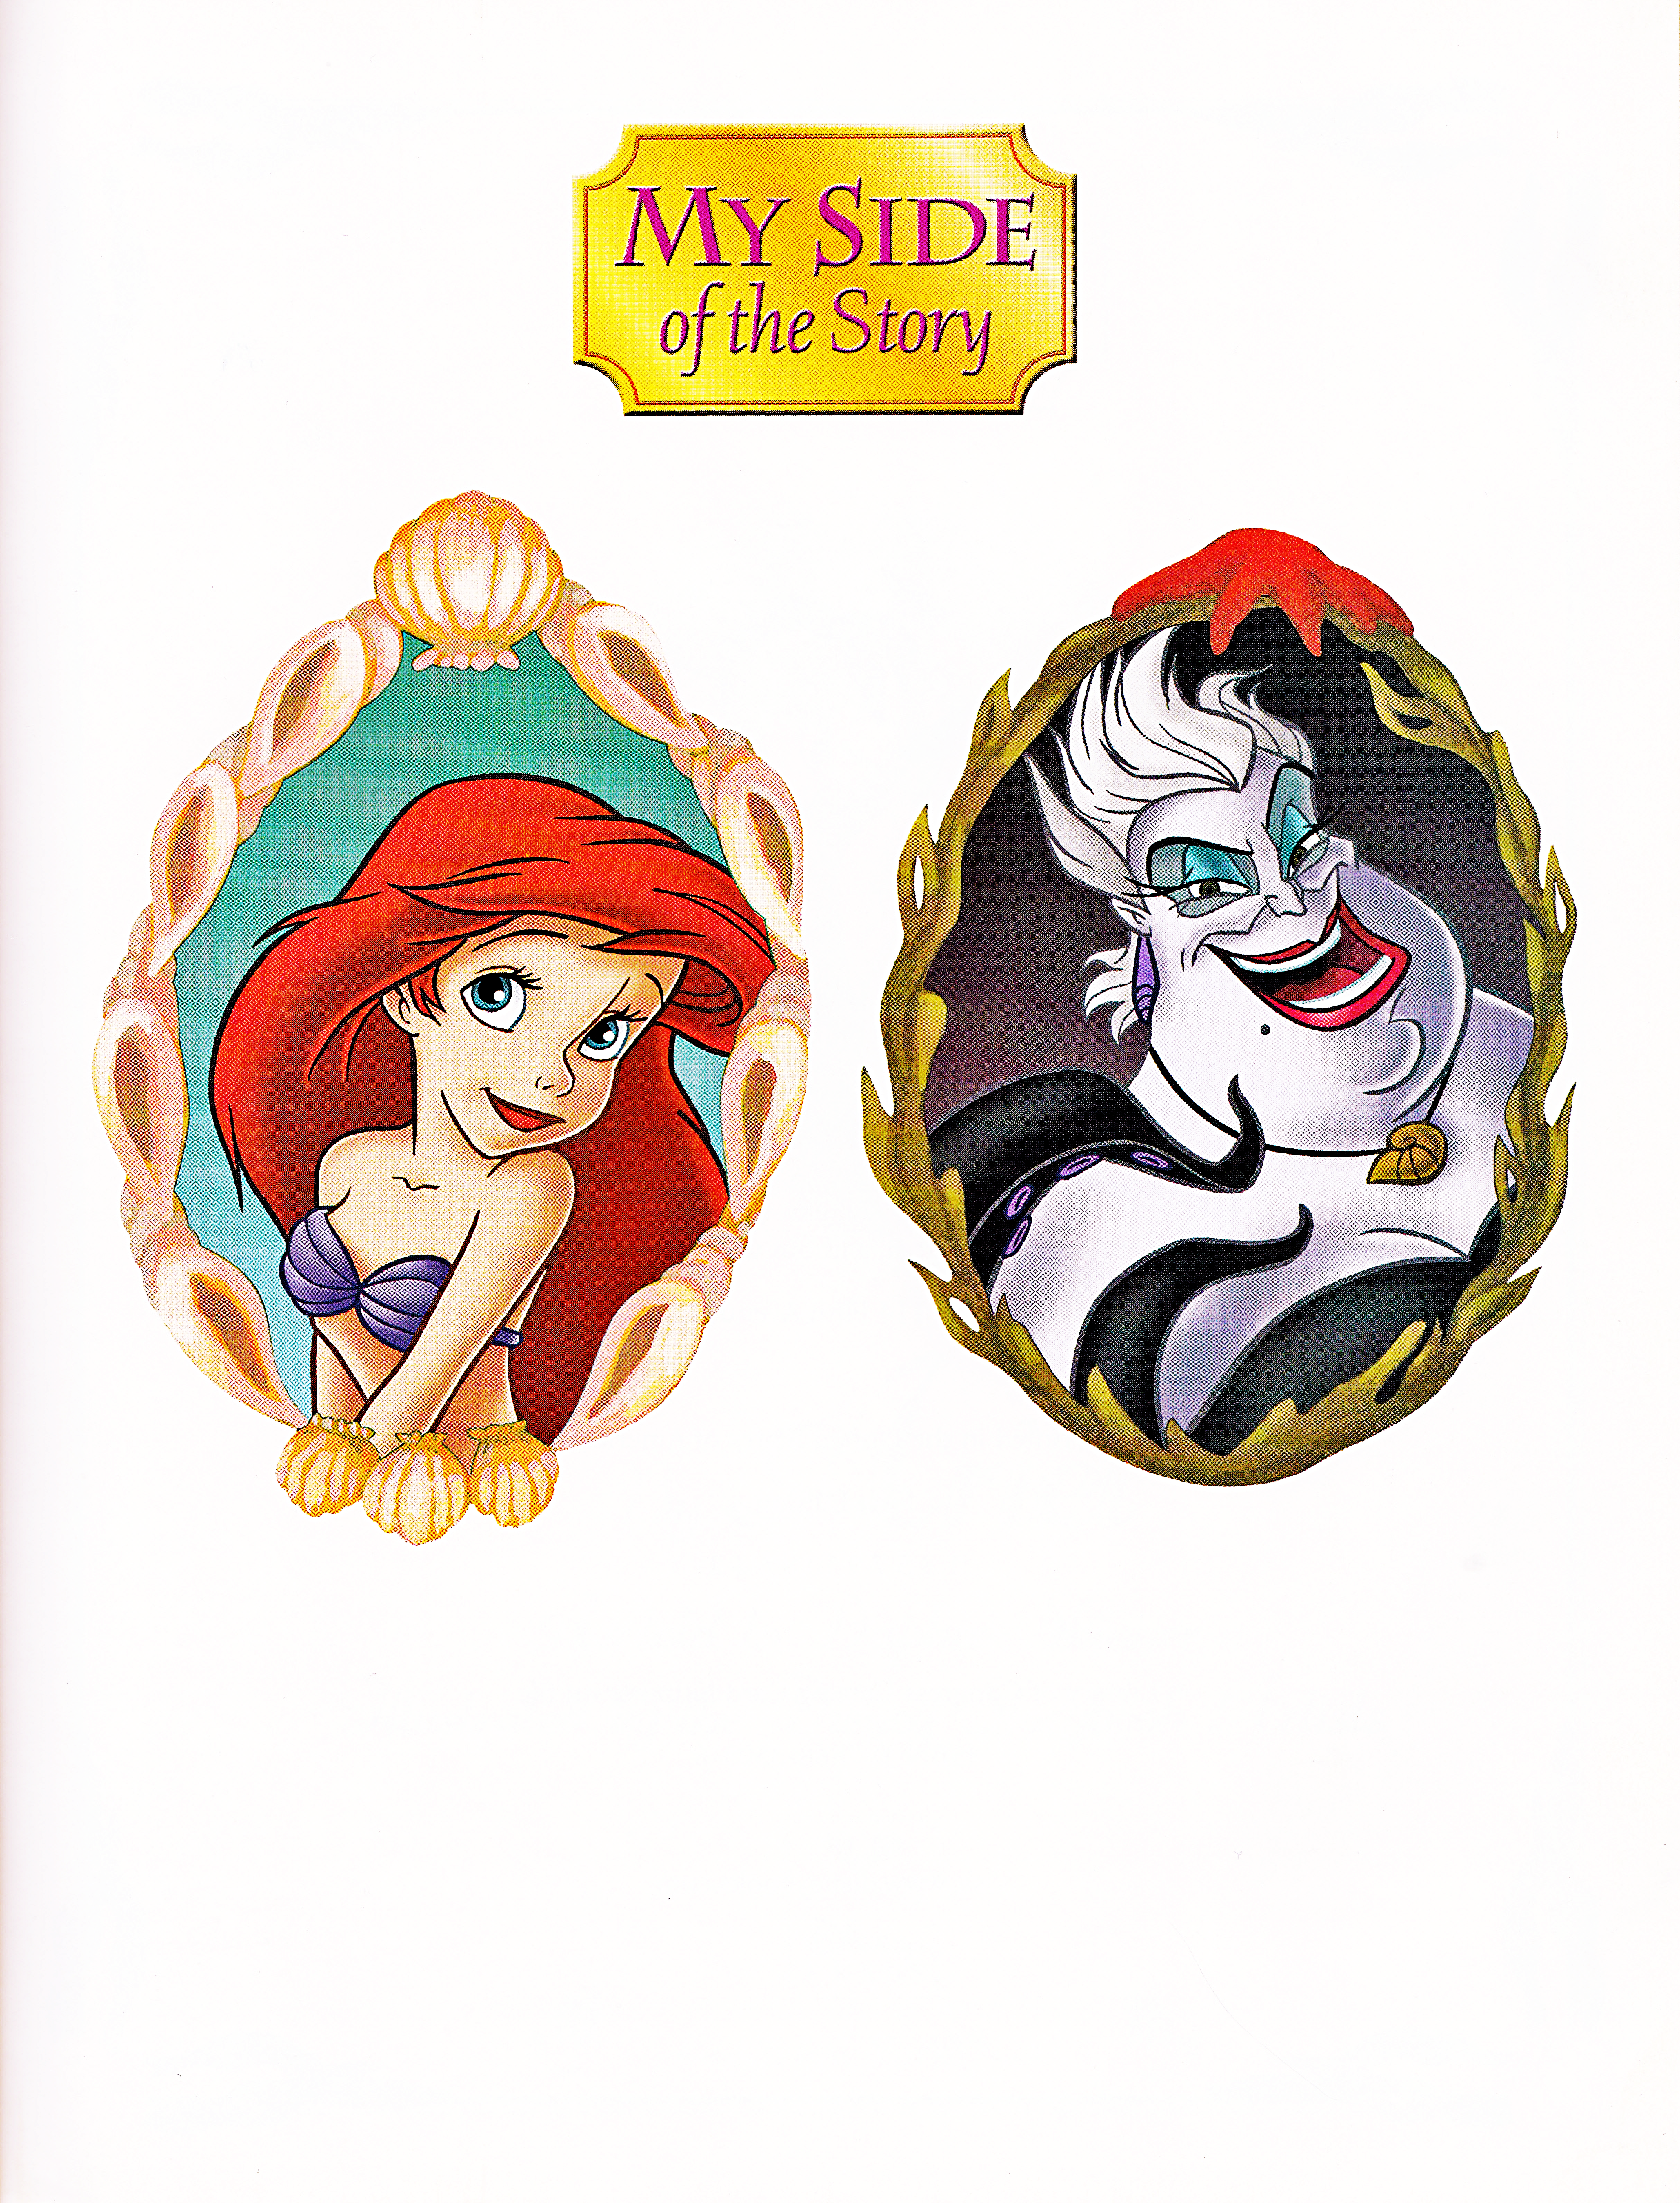 Walt Disney Books - The Little Mermaid: My Side of the Story (Princess Ariel)